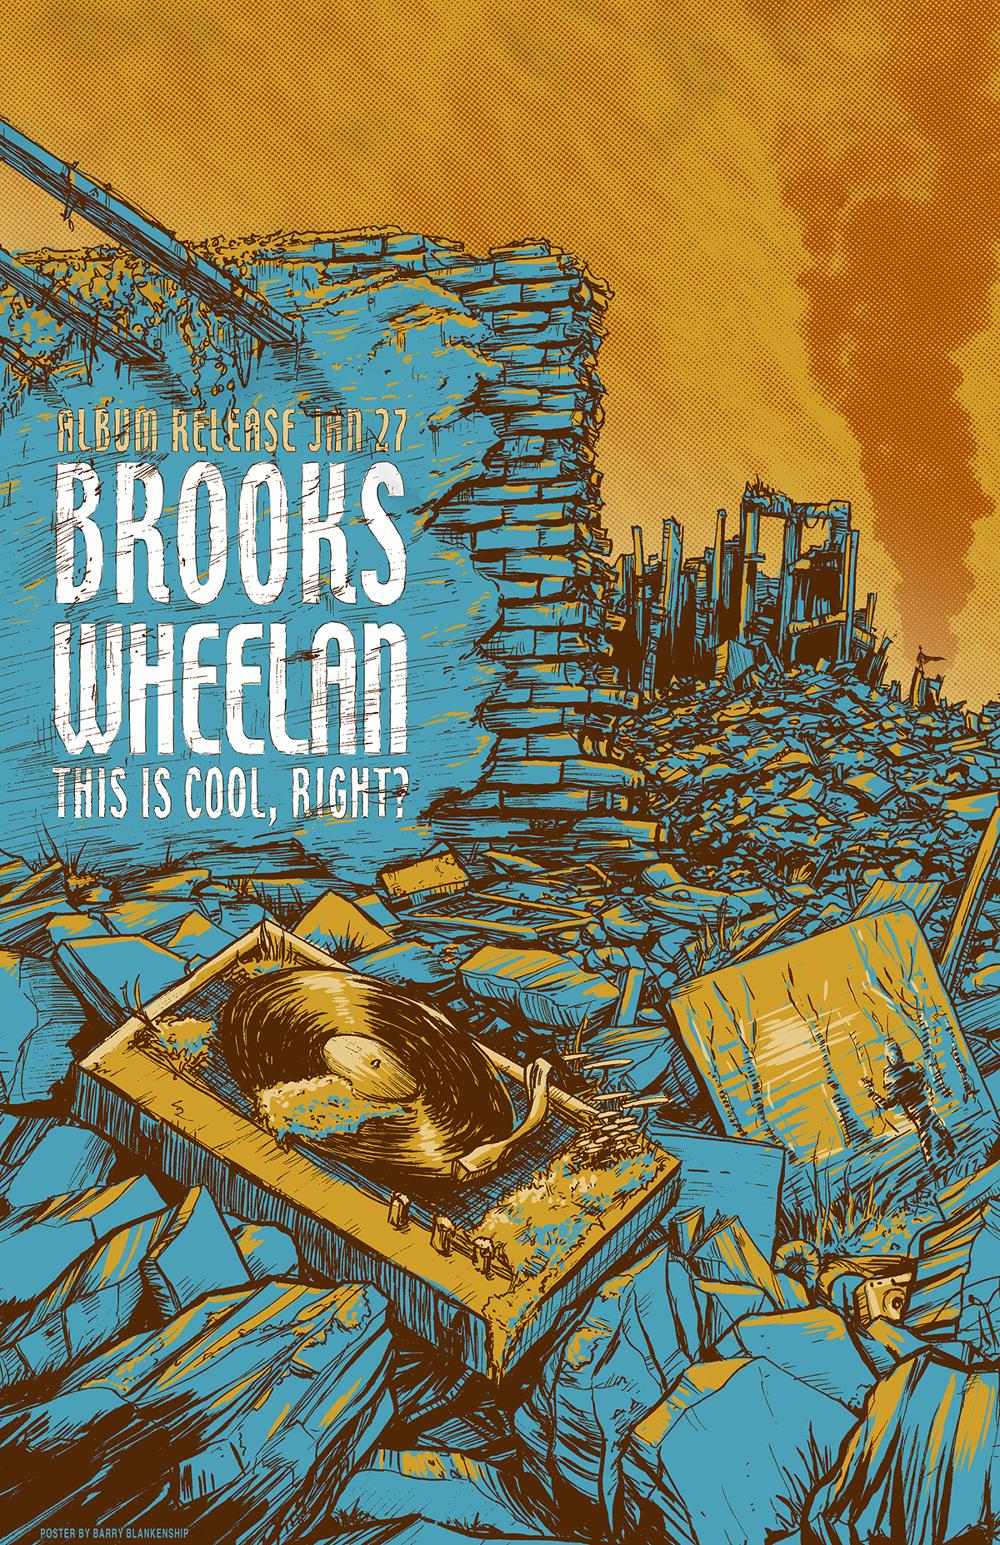 brooks_wheelan_album_release_1000.jpg